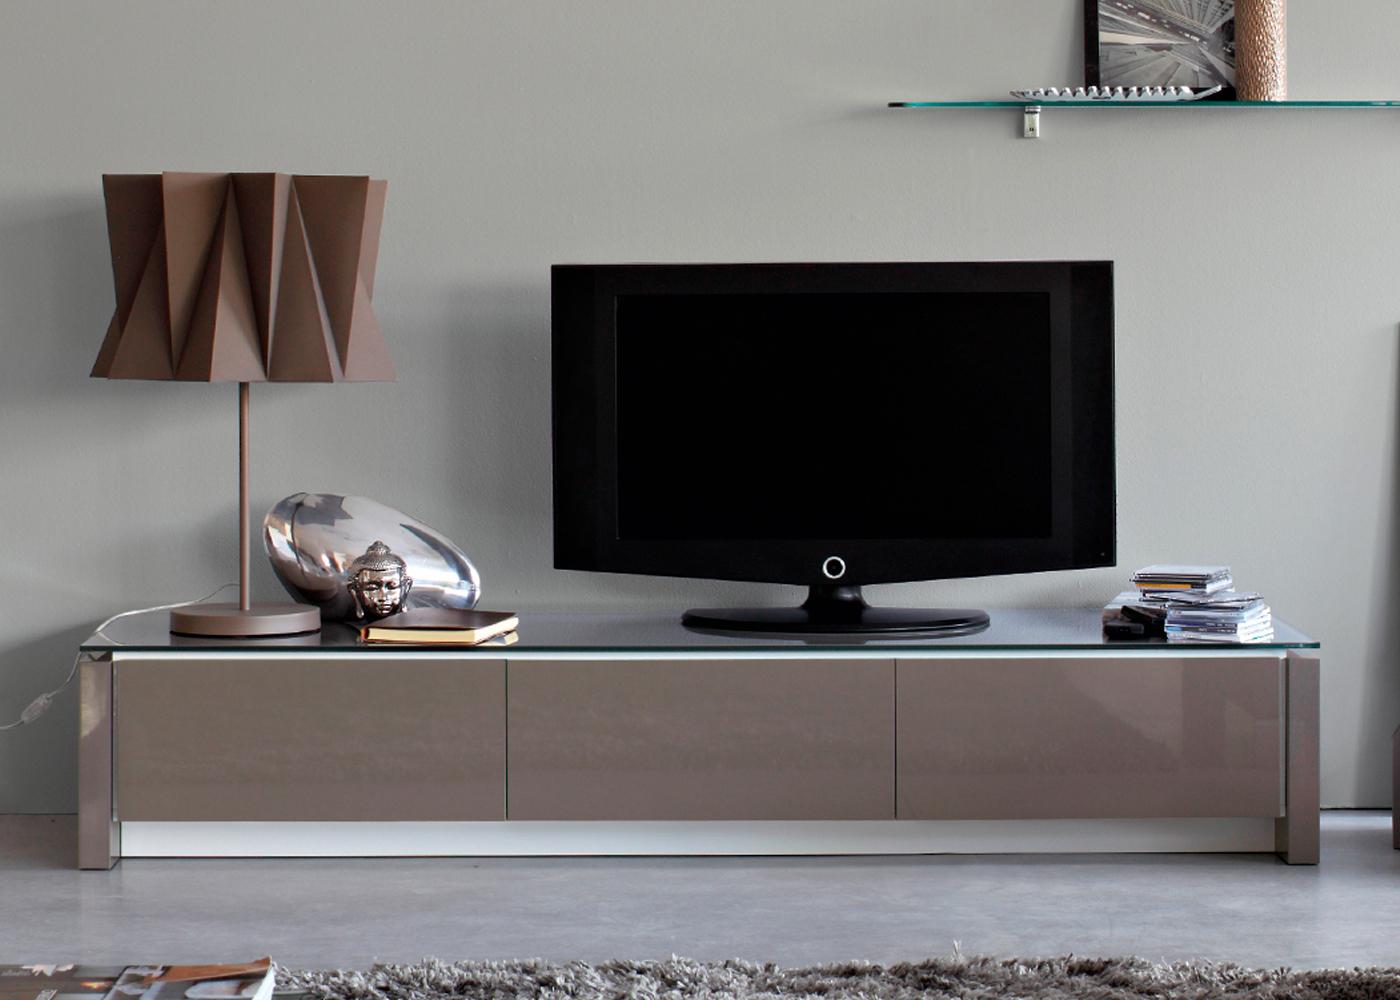 shelf units living room decorating ideas blue sofa calligaris mag tv bench - midfurn furniture superstore